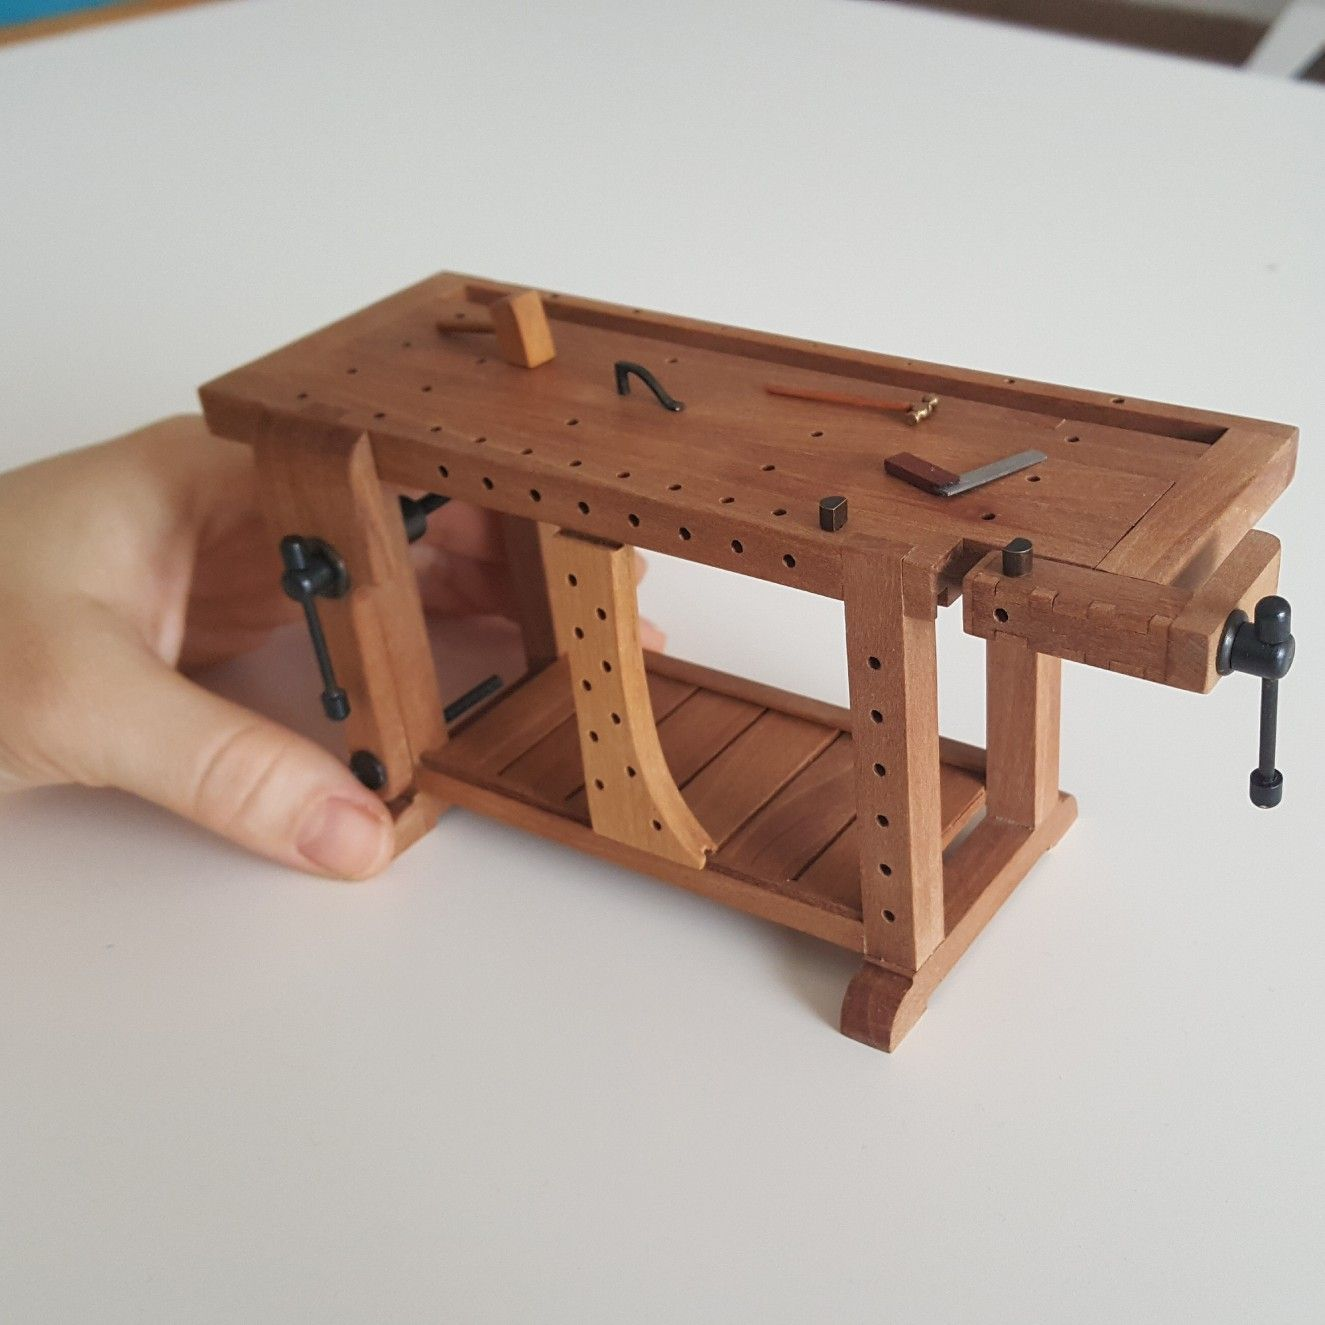 miniature dollhouse furniture woodworking. Miniature Roubo Bench, Scandinavian Workbench, Carpenter Table, Dollhouse, Furniture, Tool, Wise, Scale 1/12, Atelier, Workplace, Artisan Dollhouse Furniture Woodworking E